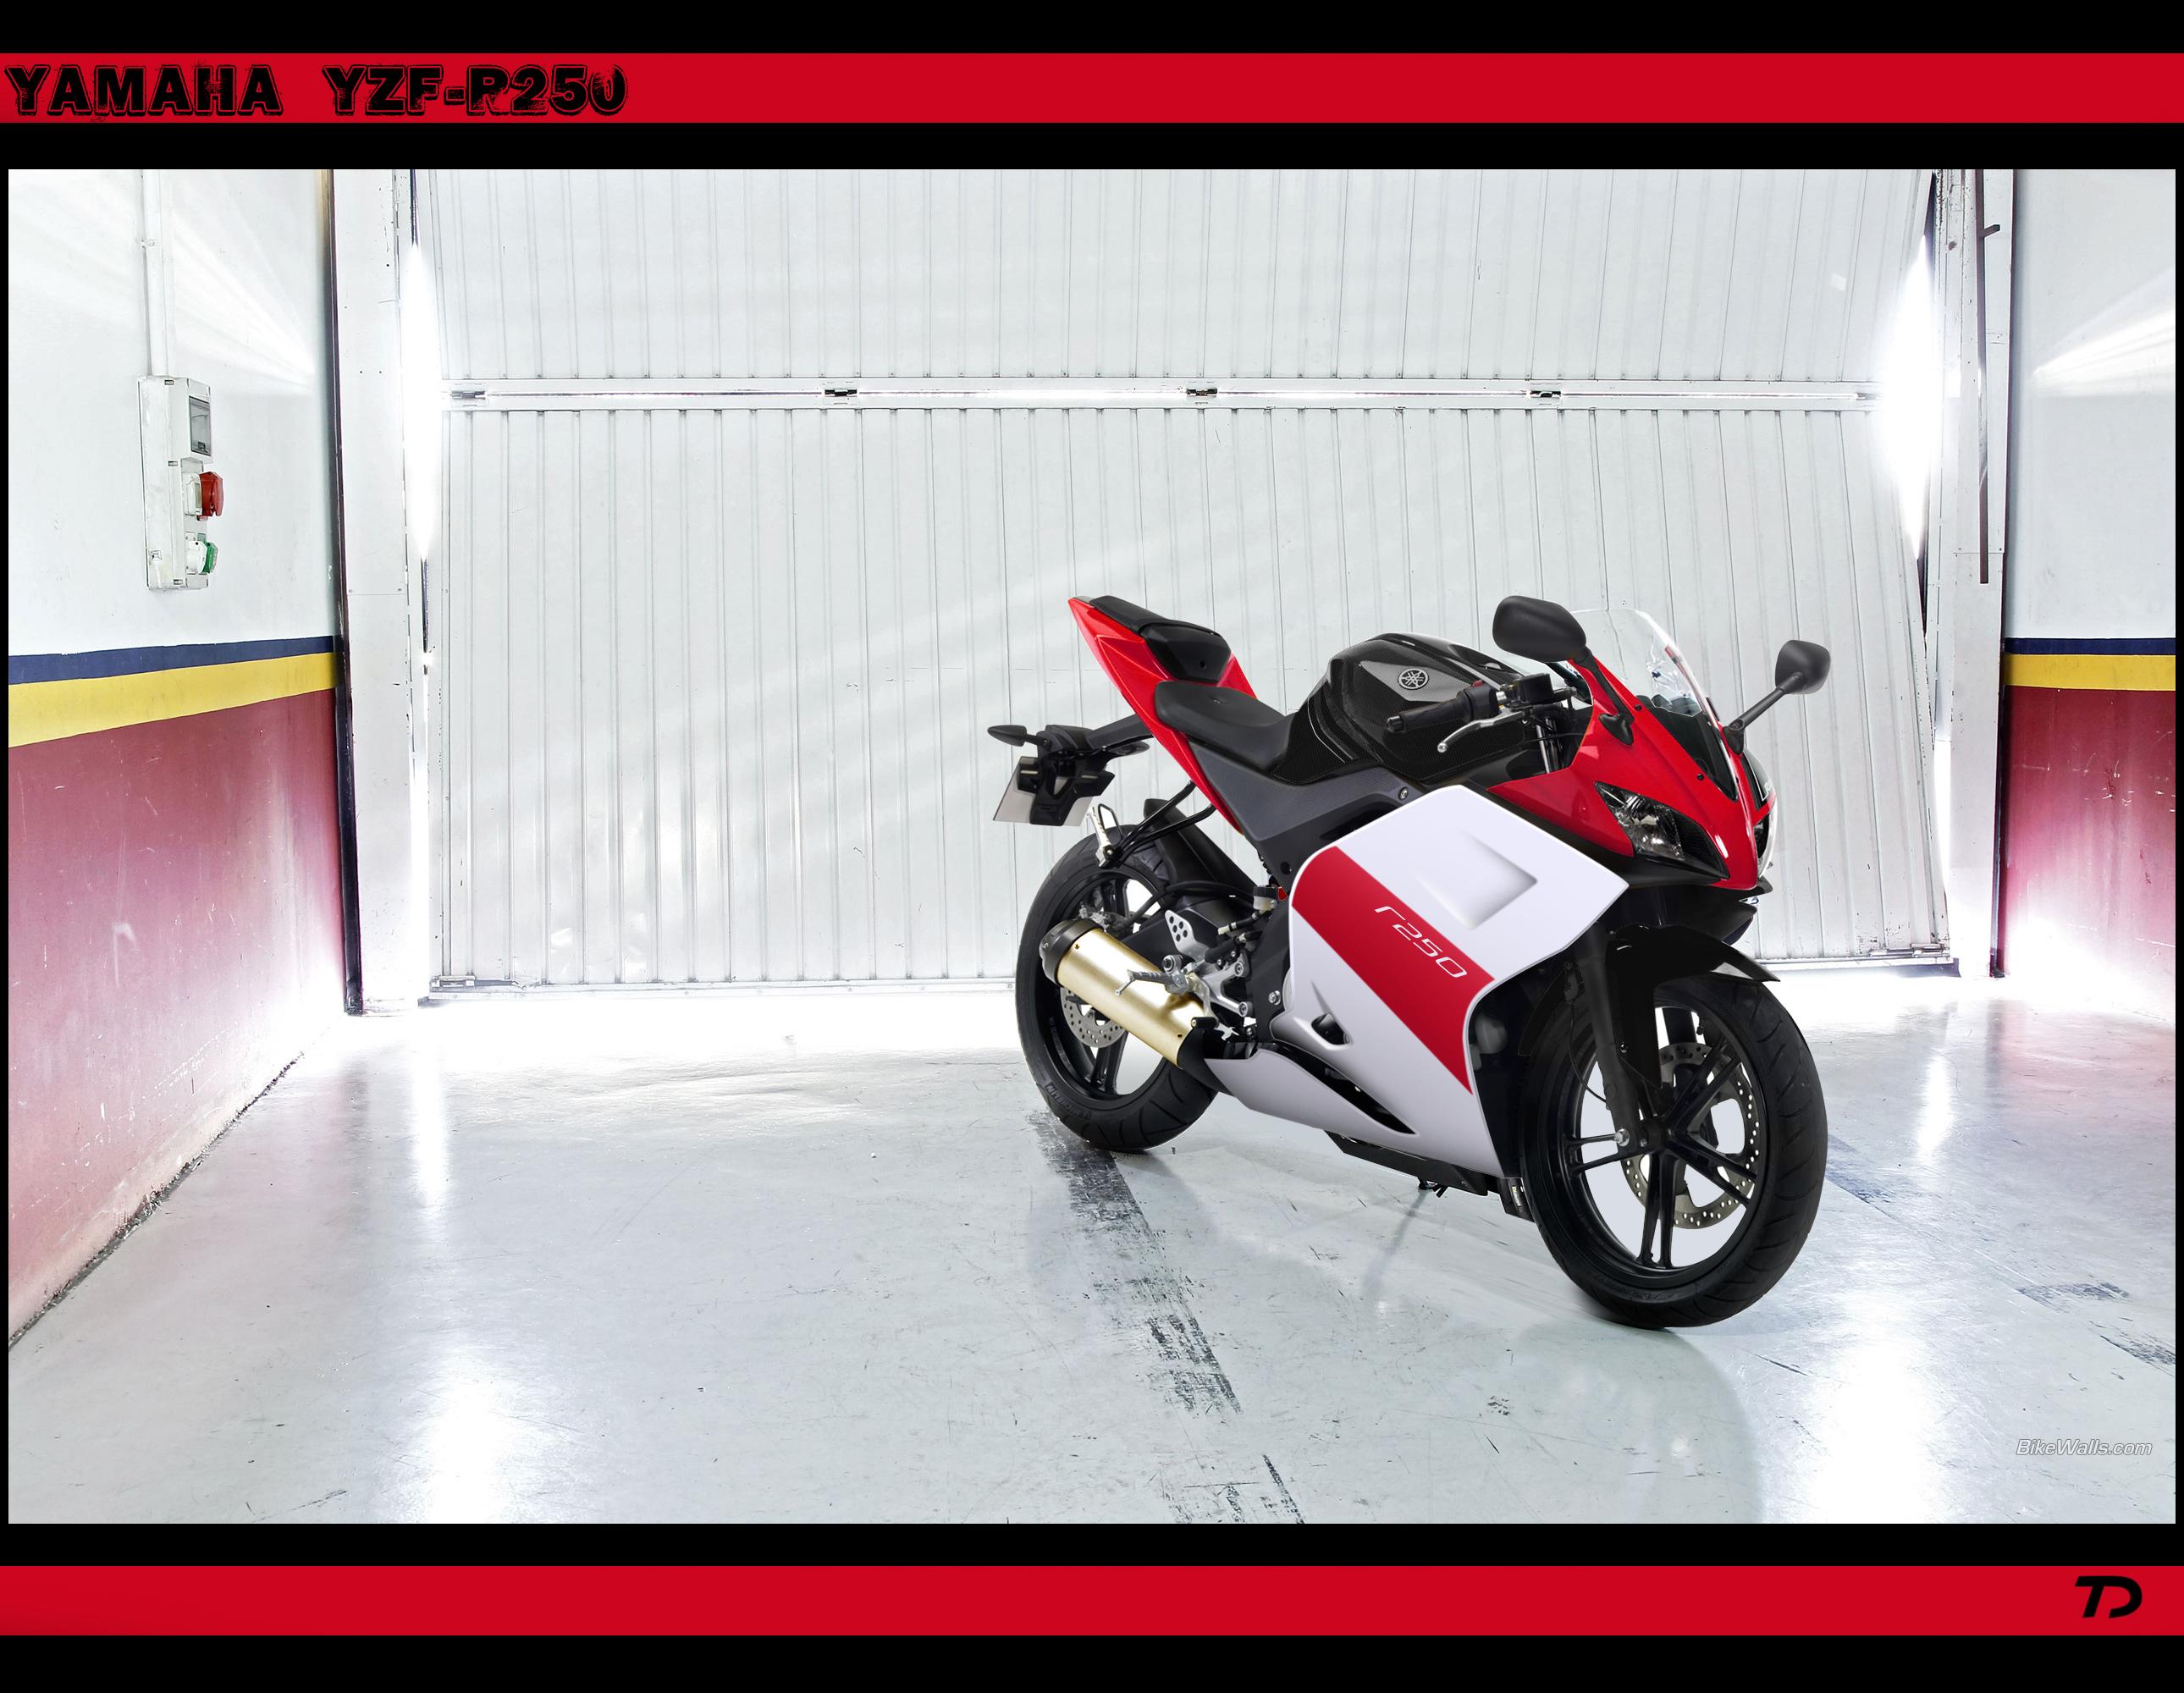 Yamaha Yzf 250r Yamaha Yzf-r250 by Tts by